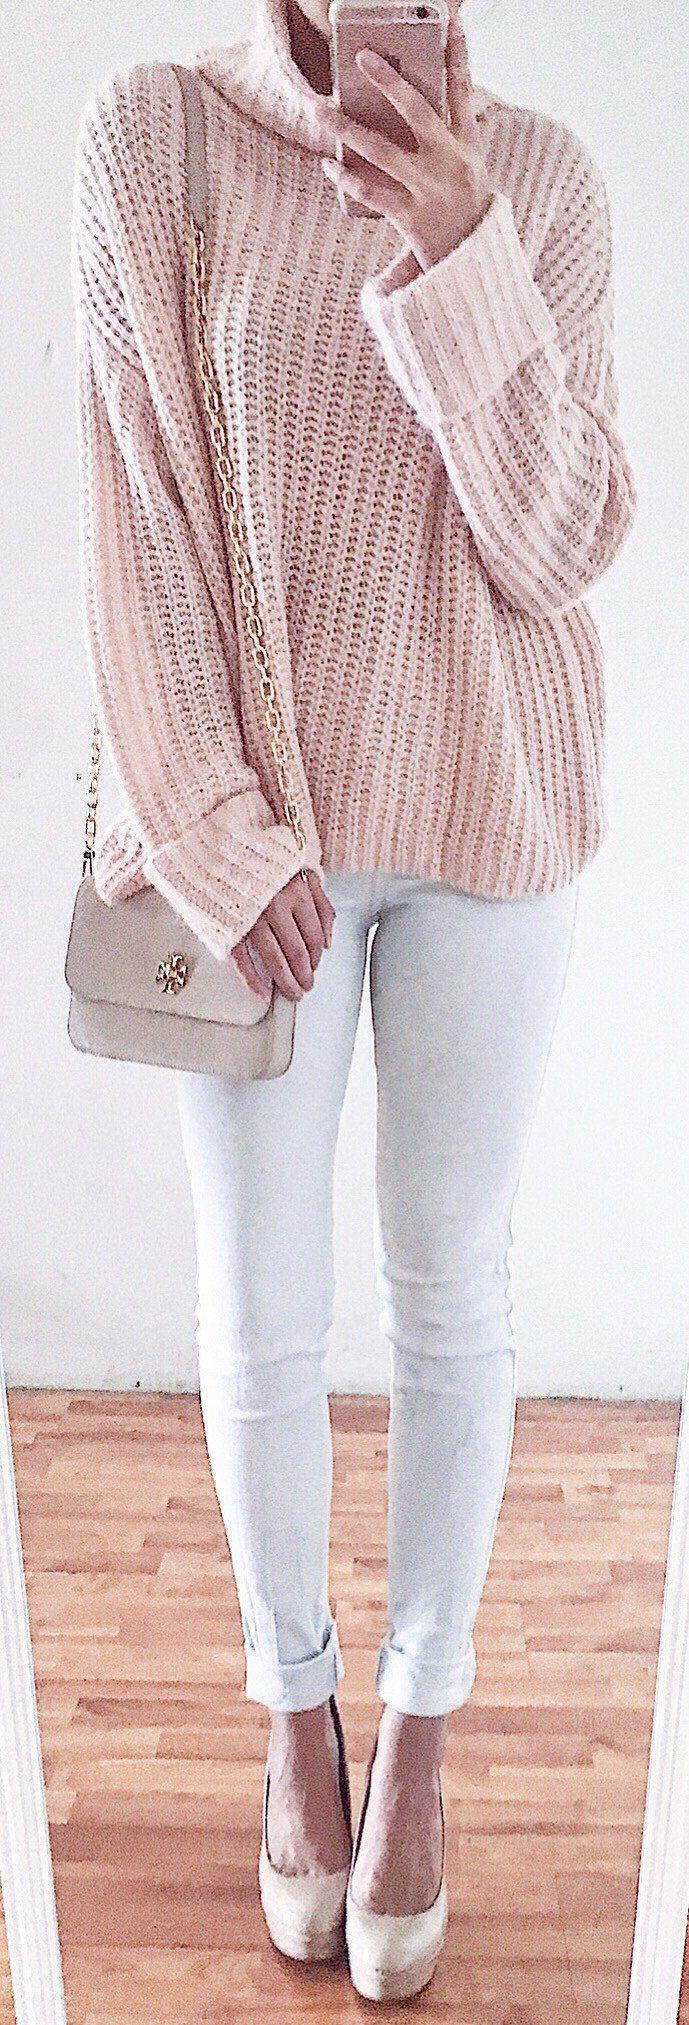 #spring #fashion /  Pink Turtleneck Knit / White Skinny Jeans / Beige Pumps